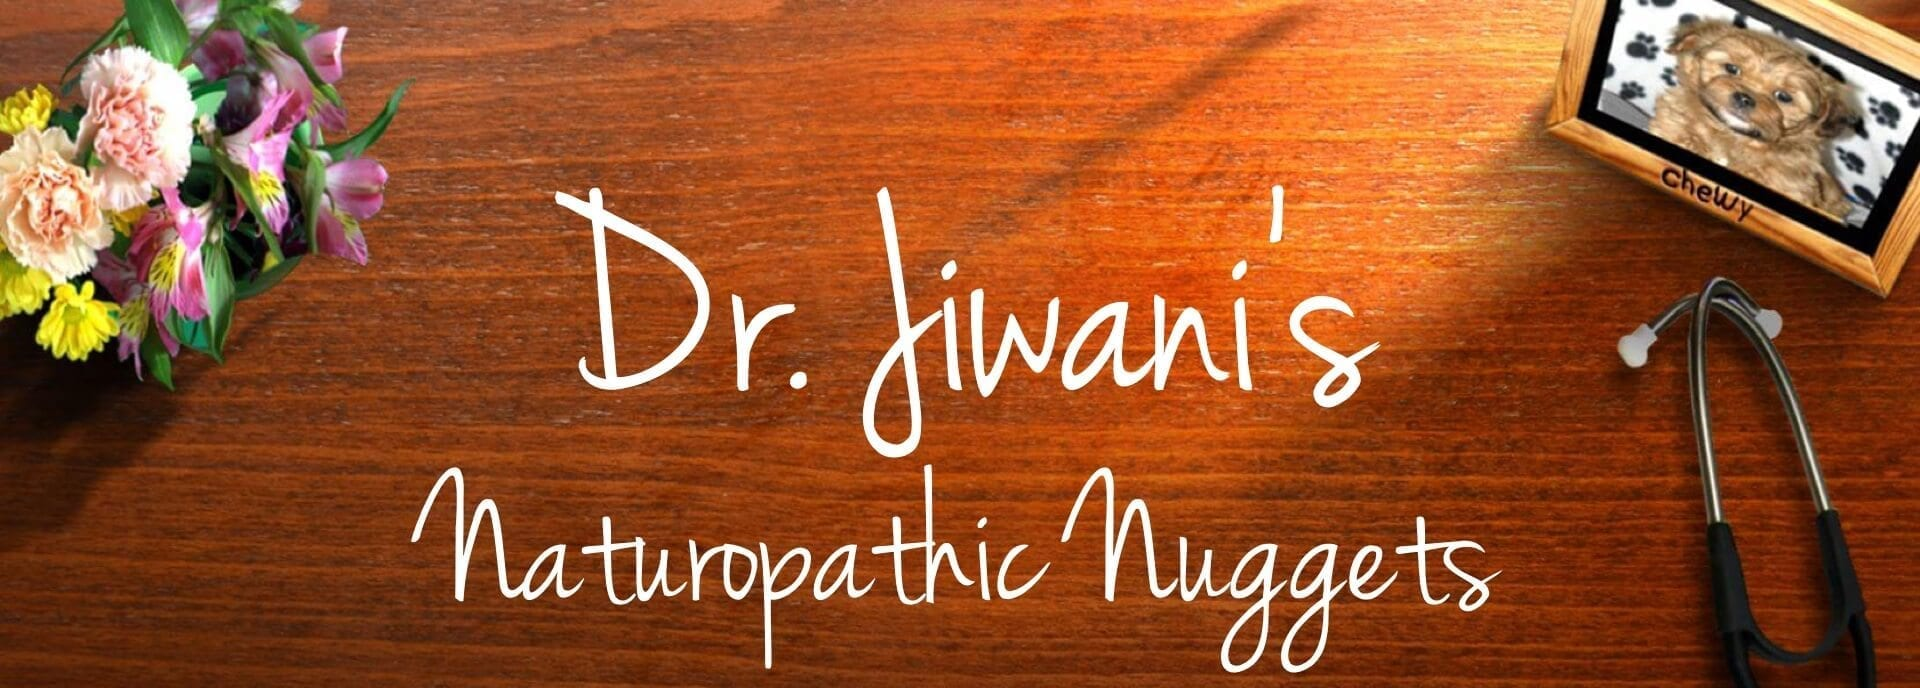 Dr. Jiwani's Naturopathic Nuggets Blog